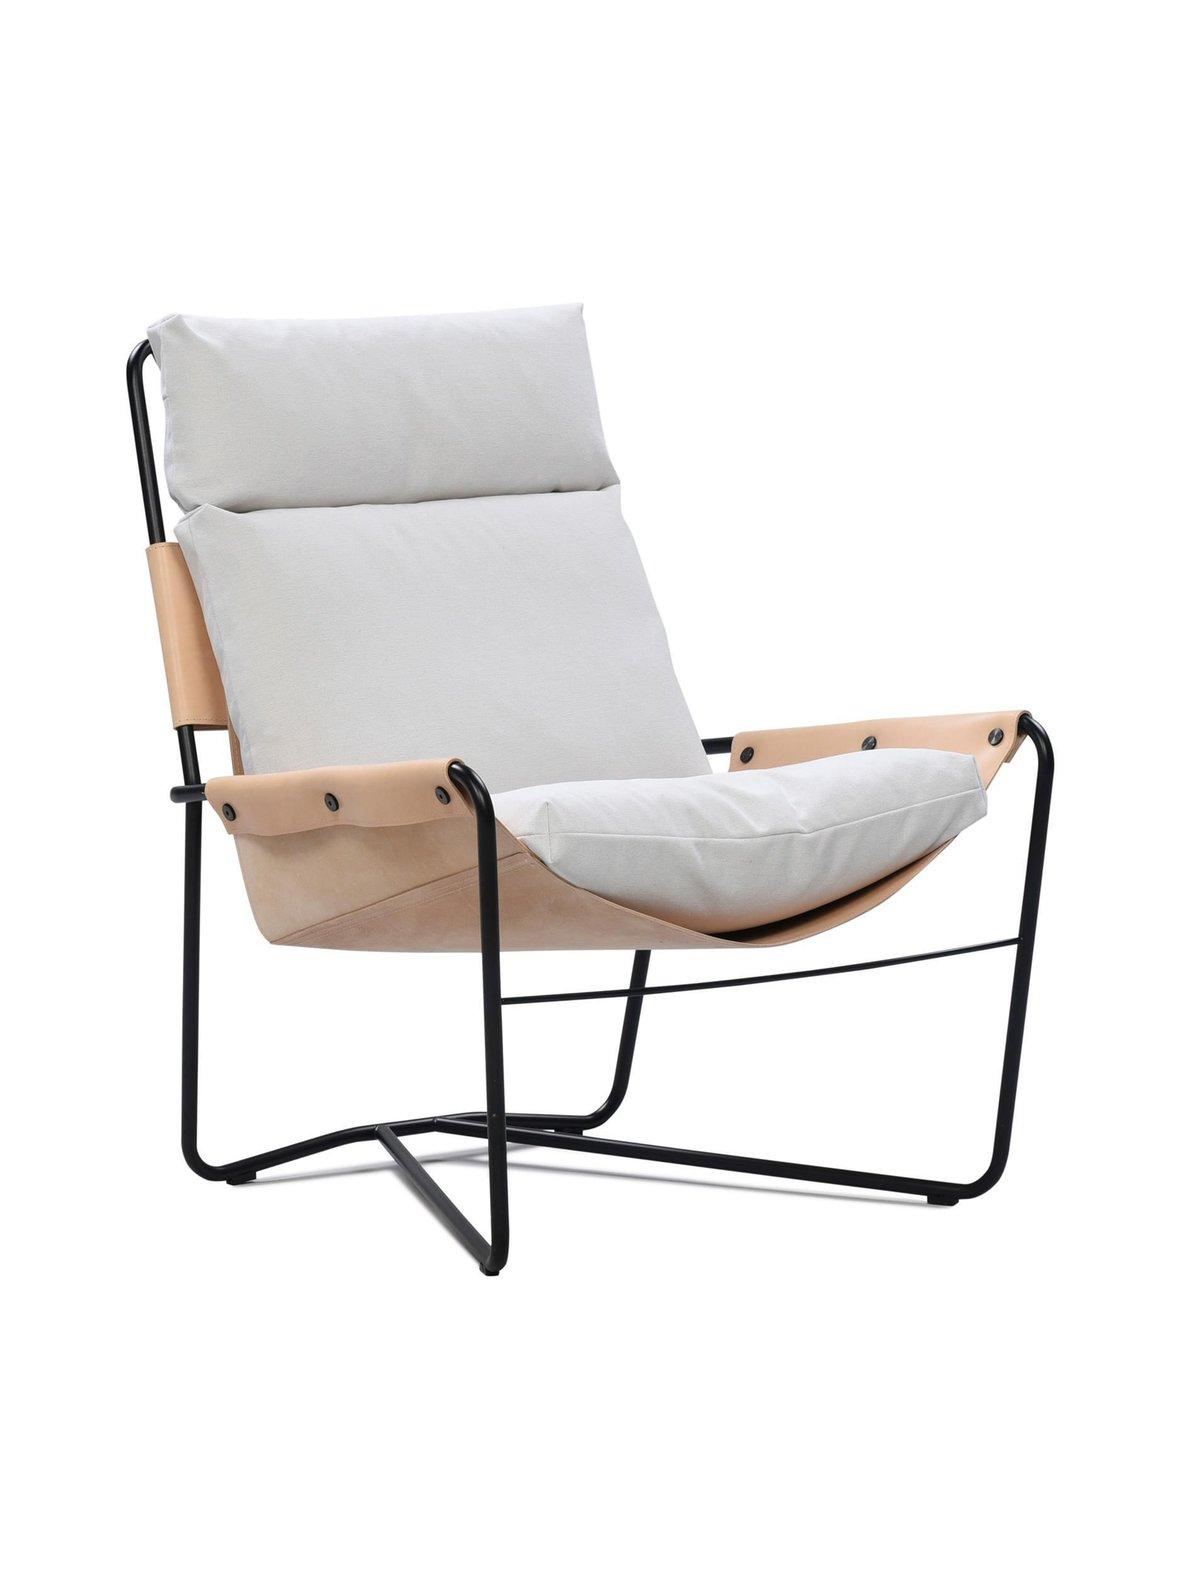 Bug-tuoli, Interface